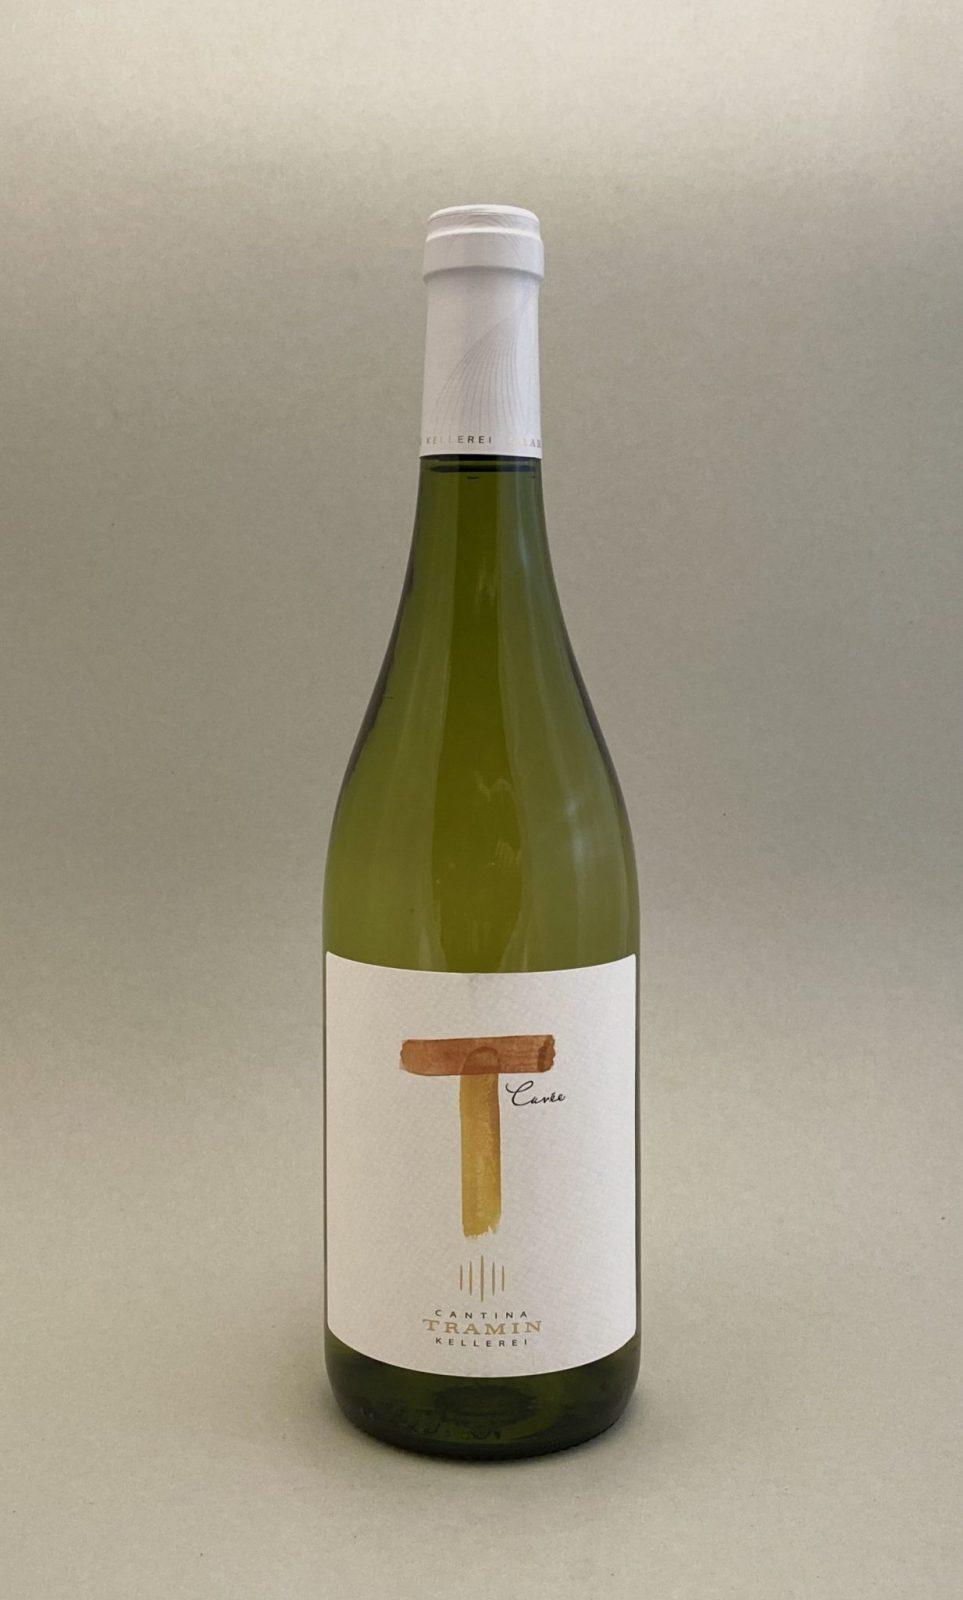 TRAMIN T Cuvée Bianco, vinoteka Sunny wines slnecnice mesto, Bratislava petrzalka, vino biele z Talianska